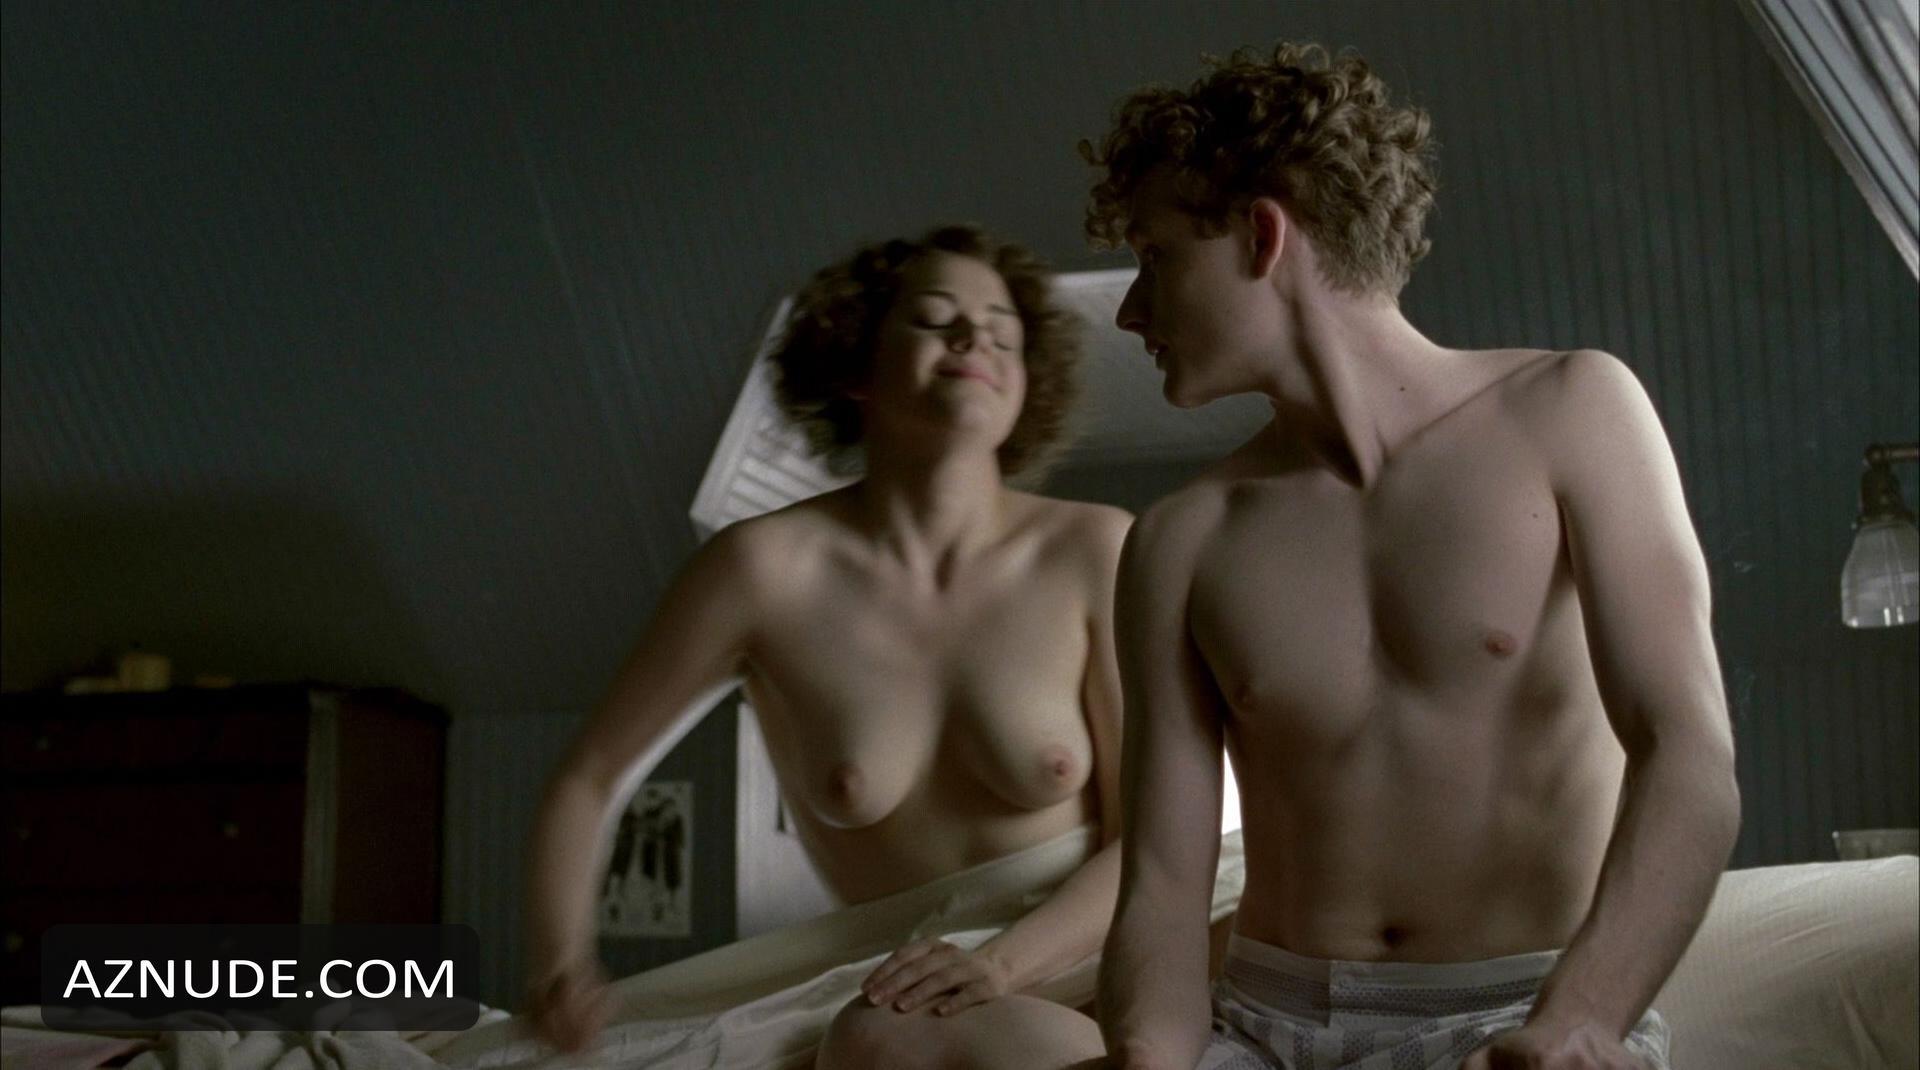 Emily meade nude sex compilation the deuce on scandalplanet - 3 2